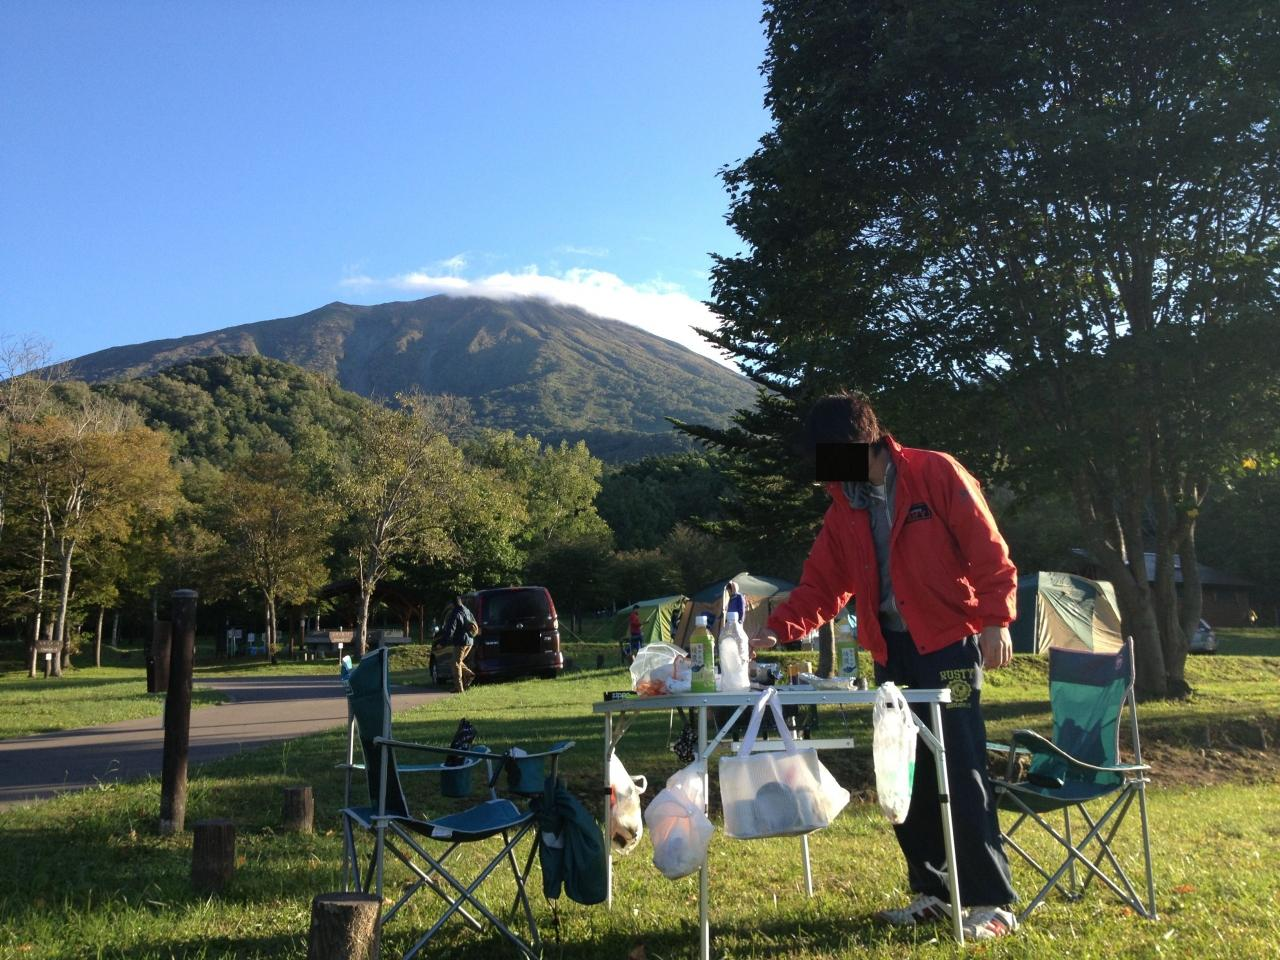 【羊蹄山自然公園キャンプ場】洞爺湖~羊蹄山~洞爺湖